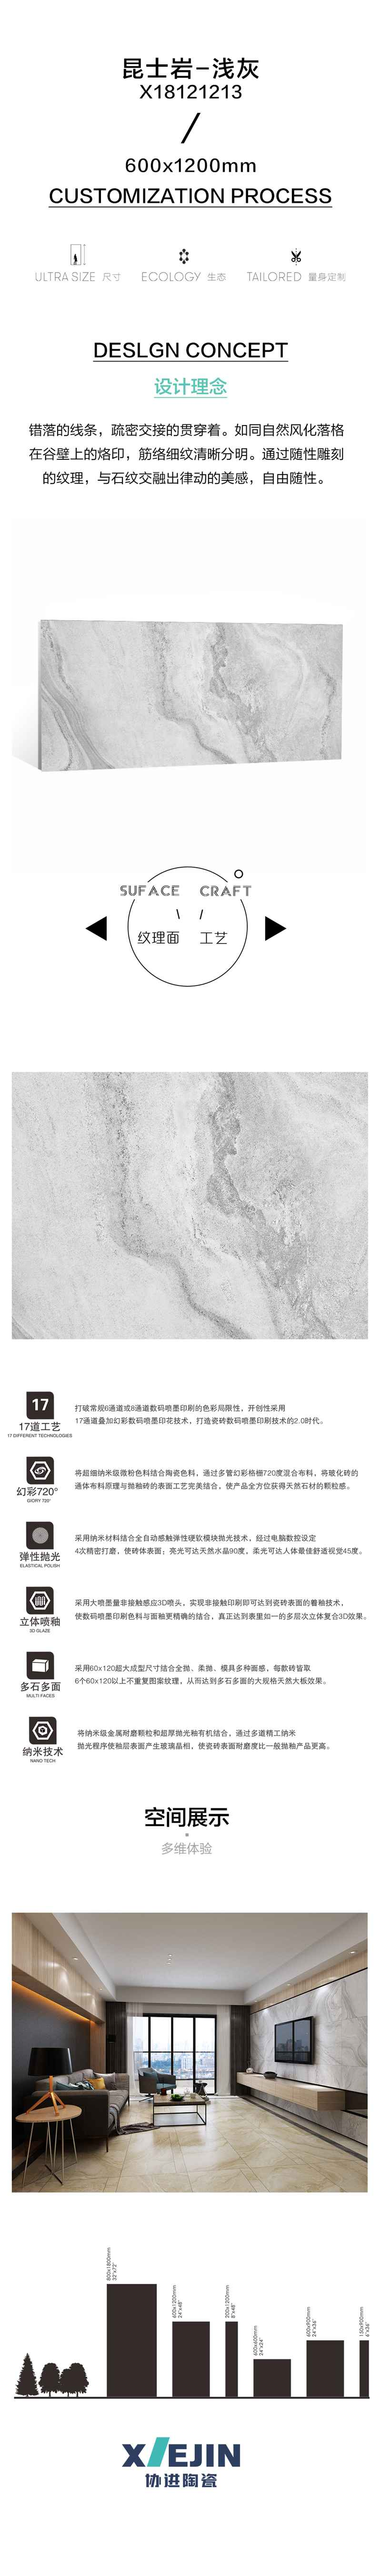 X18121213--20.jpg